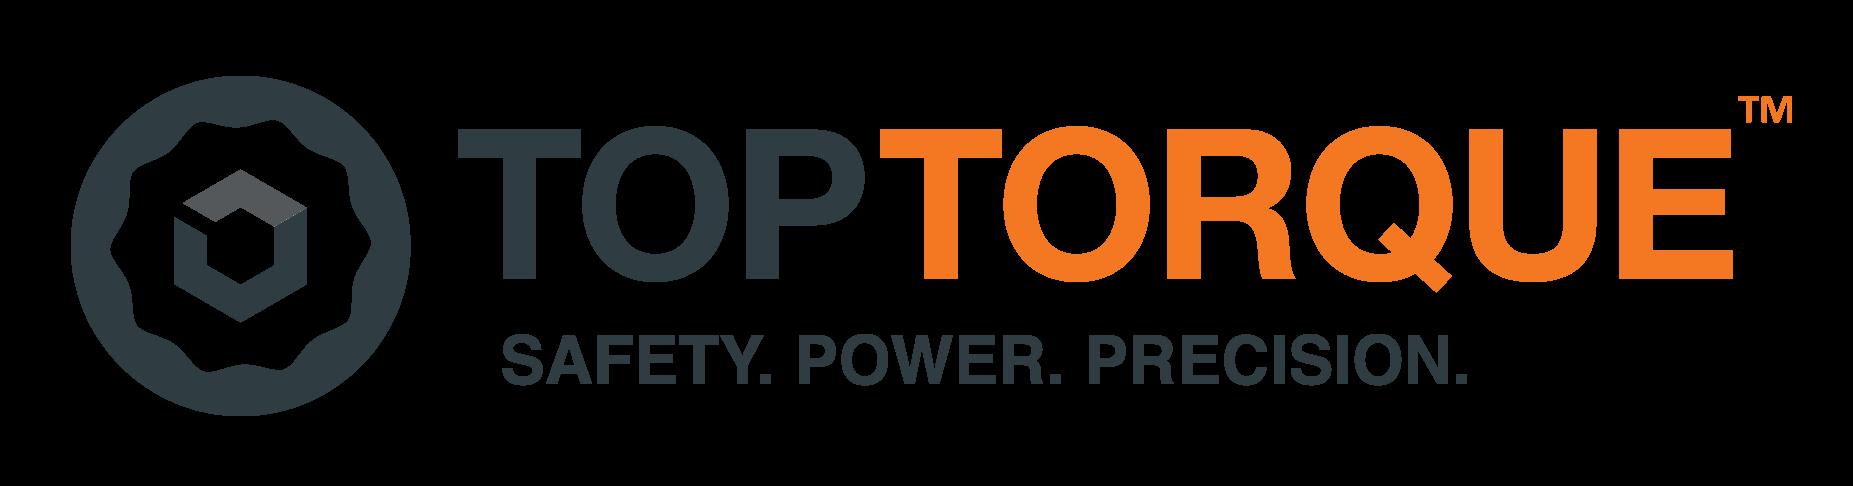 Engentus TopTorque Logo2